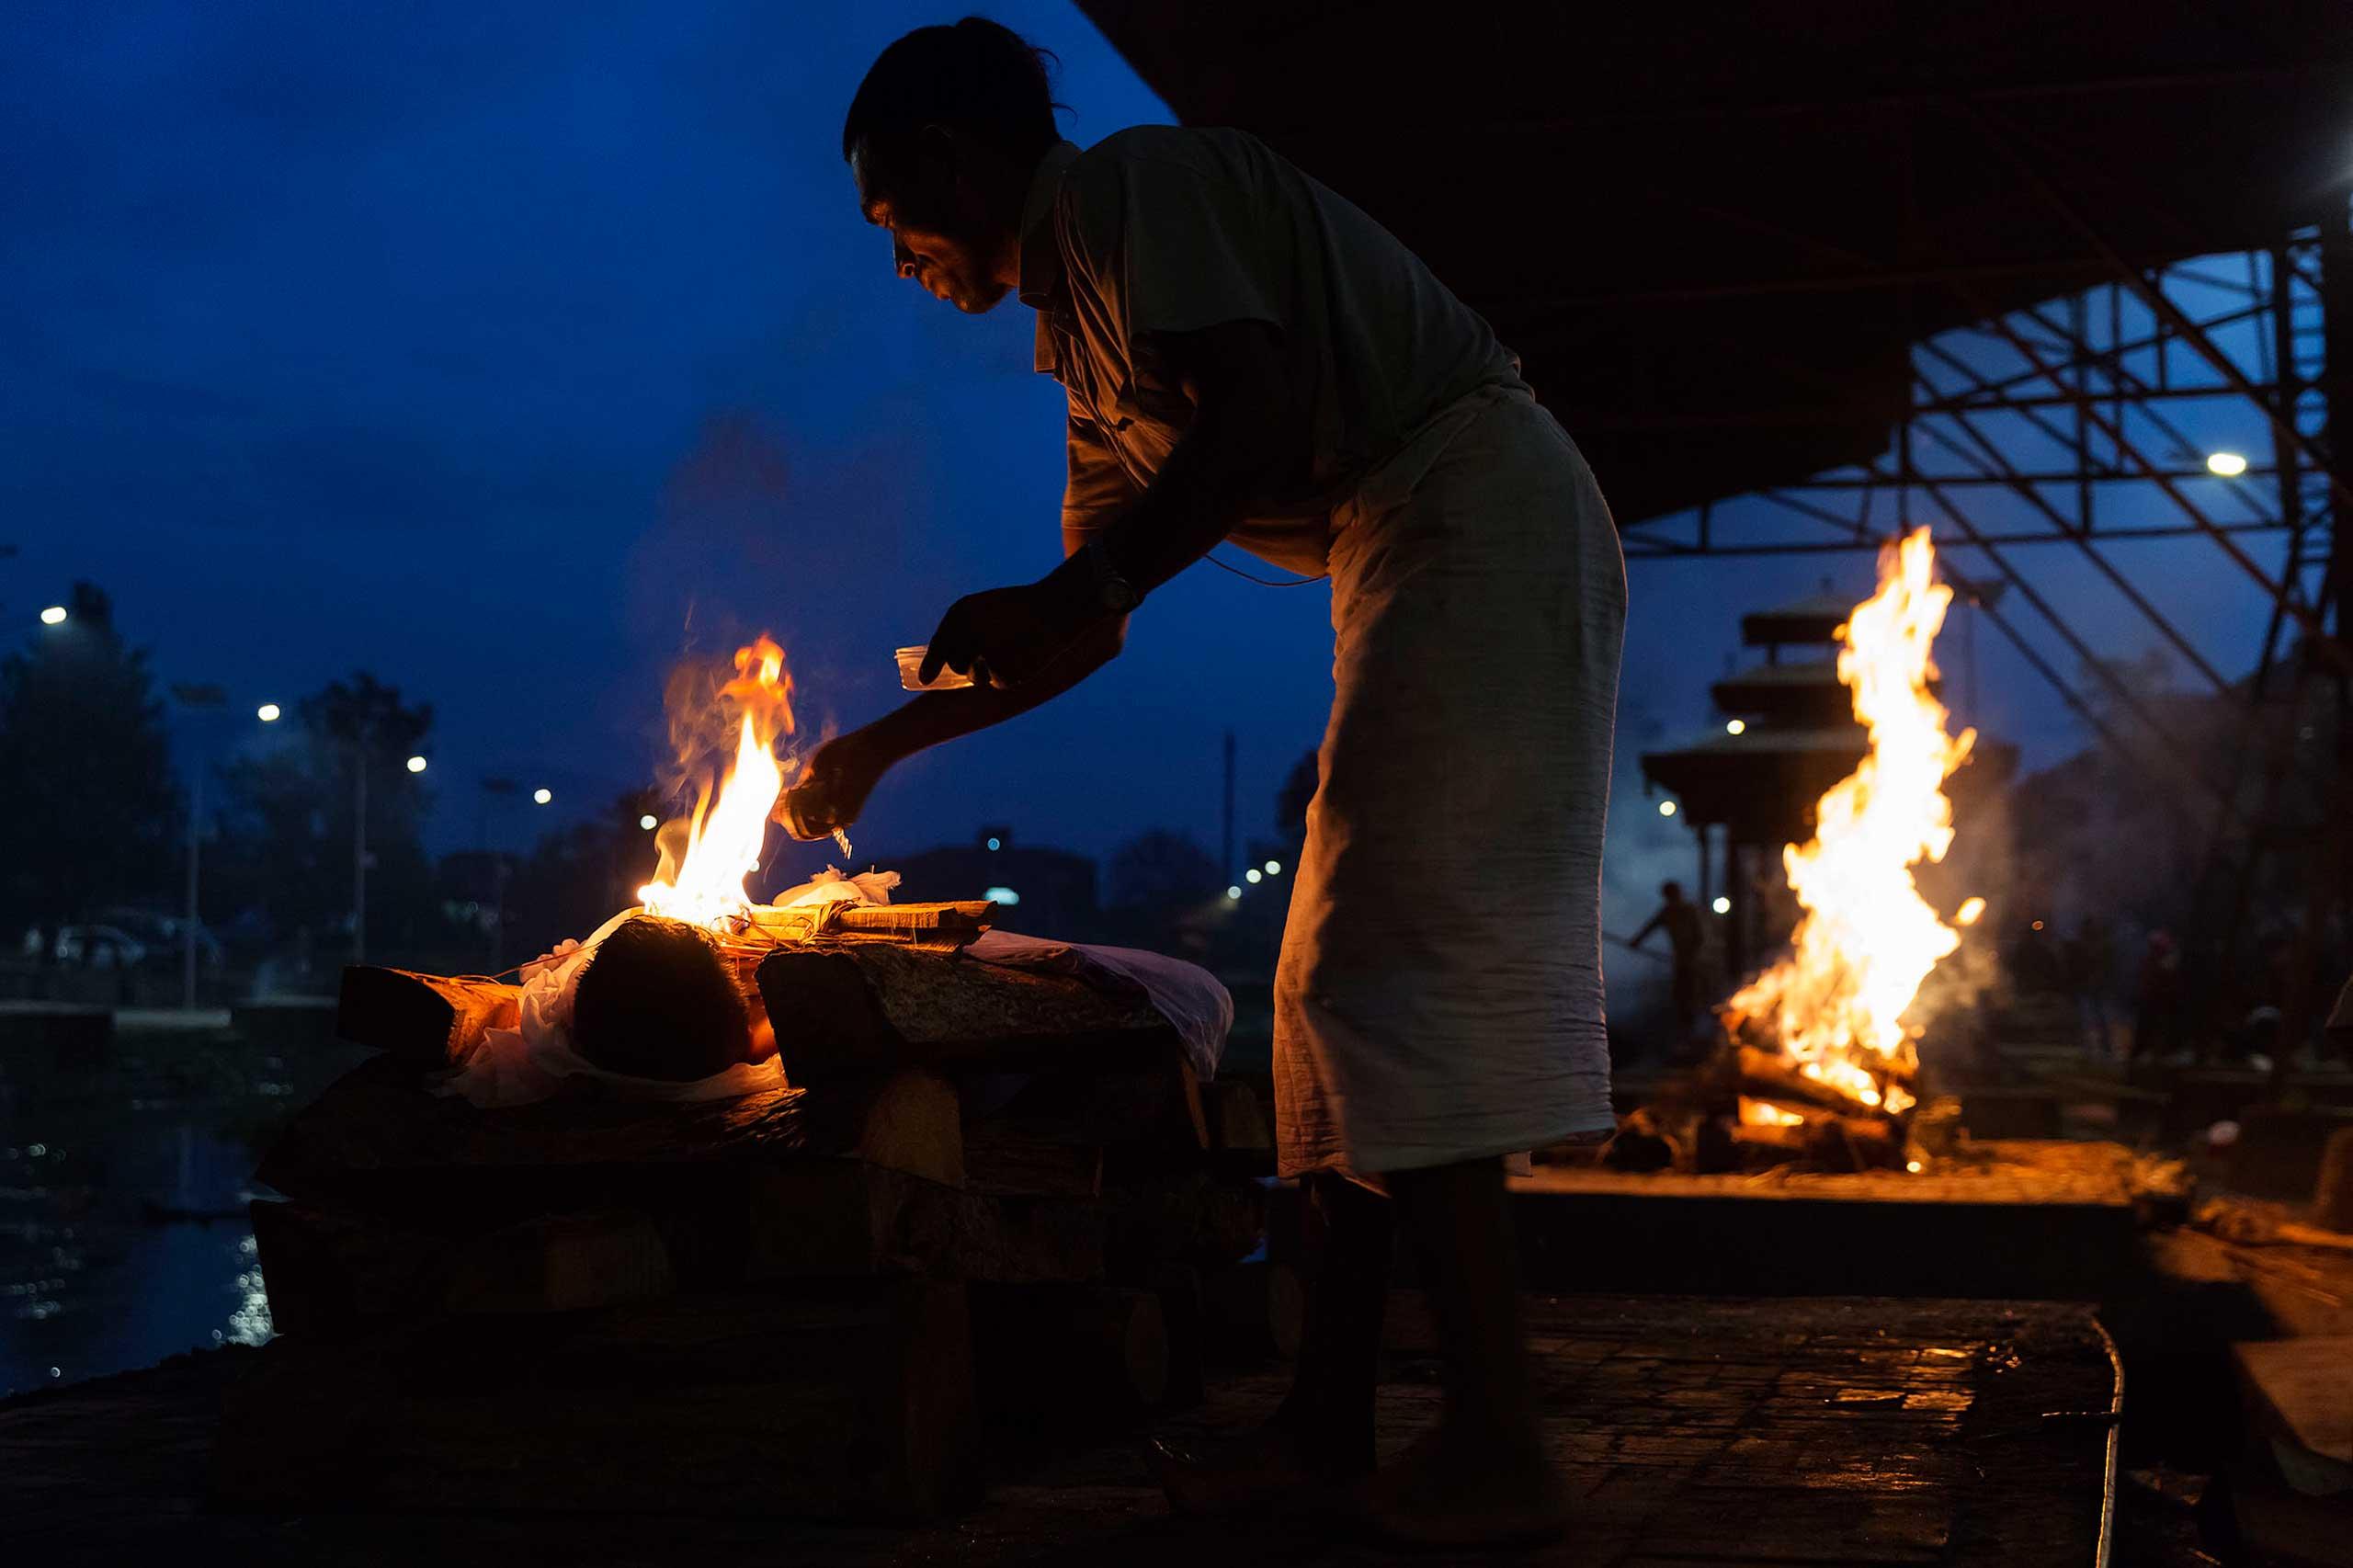 A man performs a Hindu cremation ritual at the Pashupatinath Temple in Kathmandu, April 28, 2015.